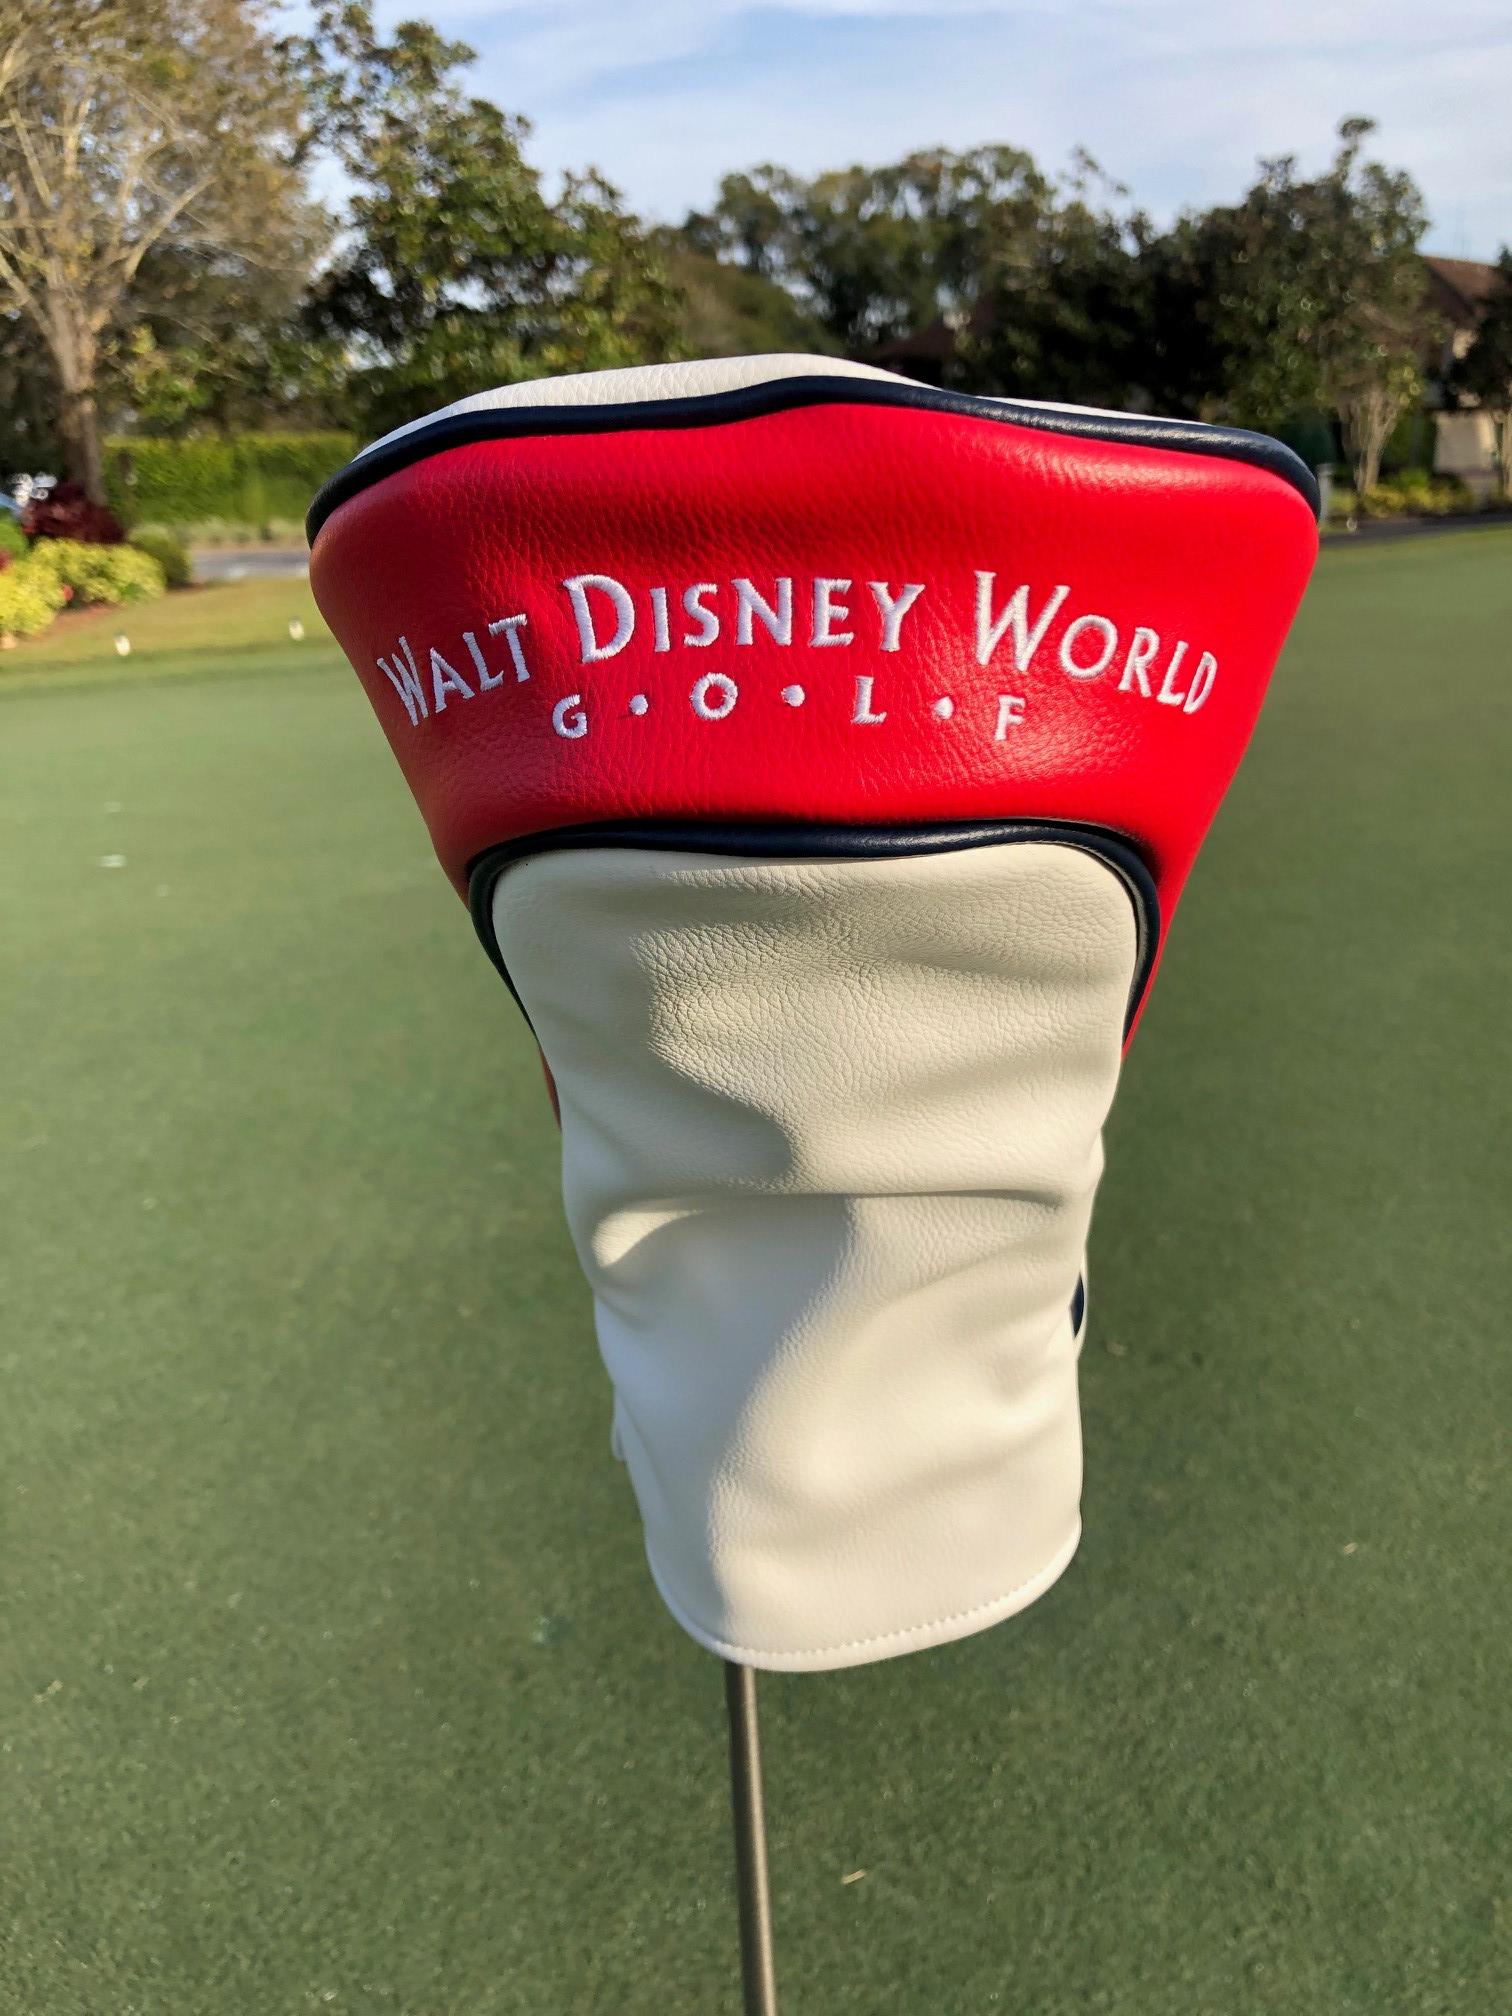 Disney Golf Head Covers